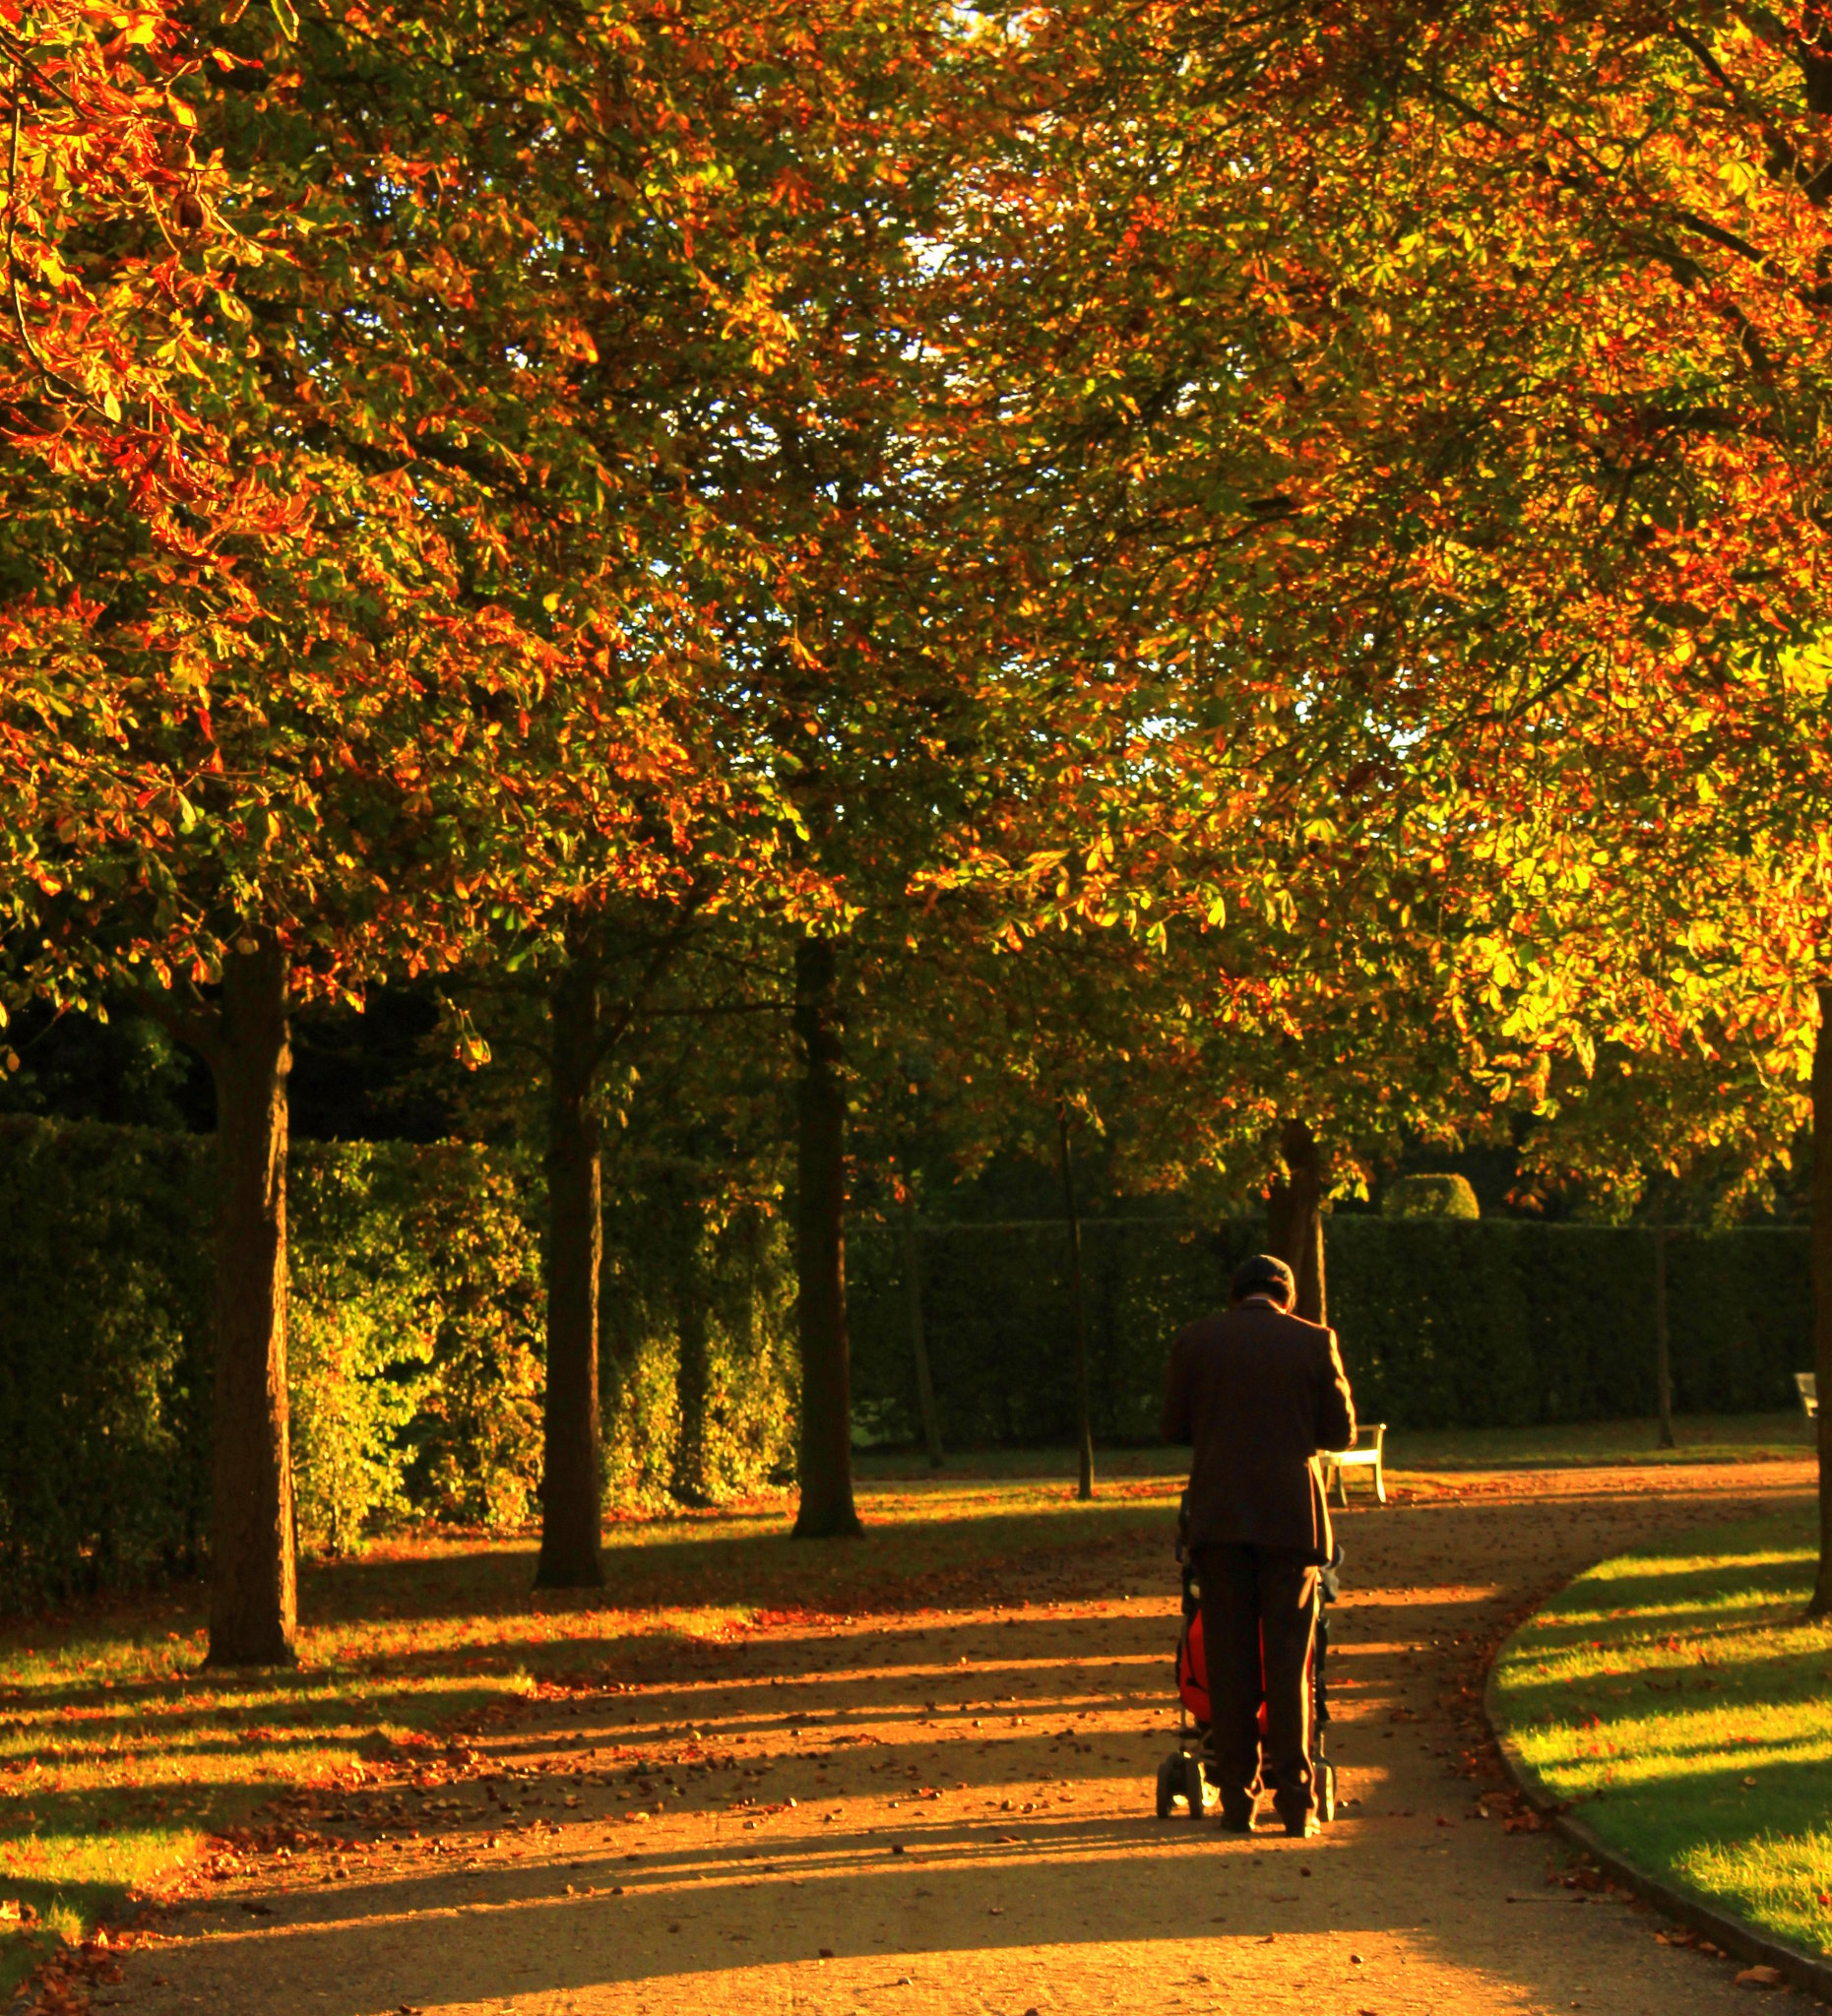 Autumn is beautiful in Potsdam